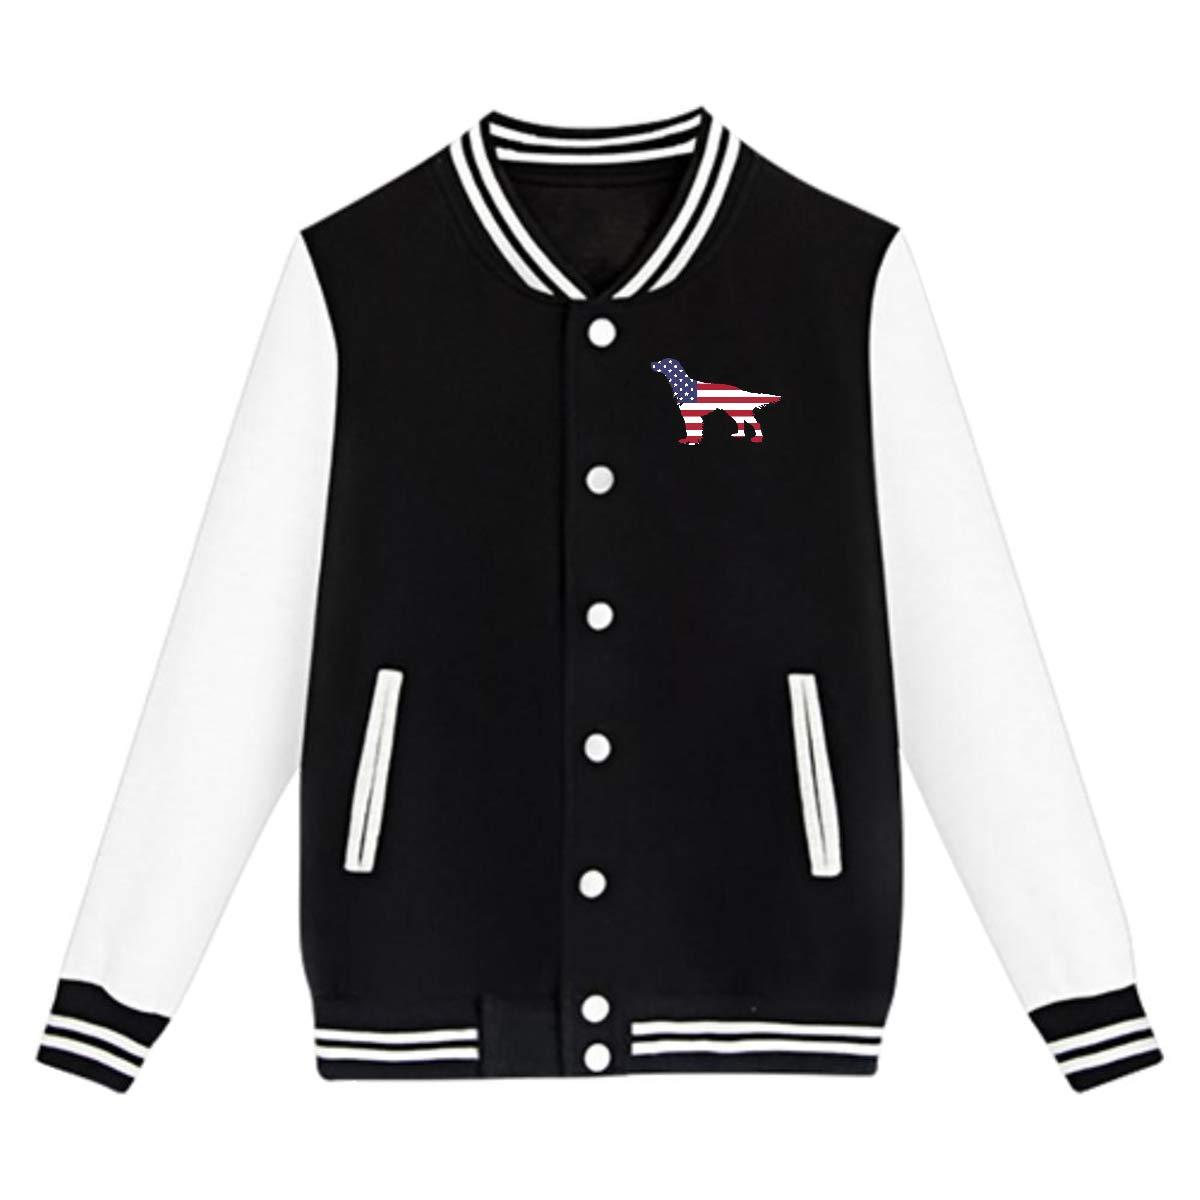 NJKM5MJ Unisex Teen Baseball Uniform Jacket American Flag Dog Sweater Sport Coat